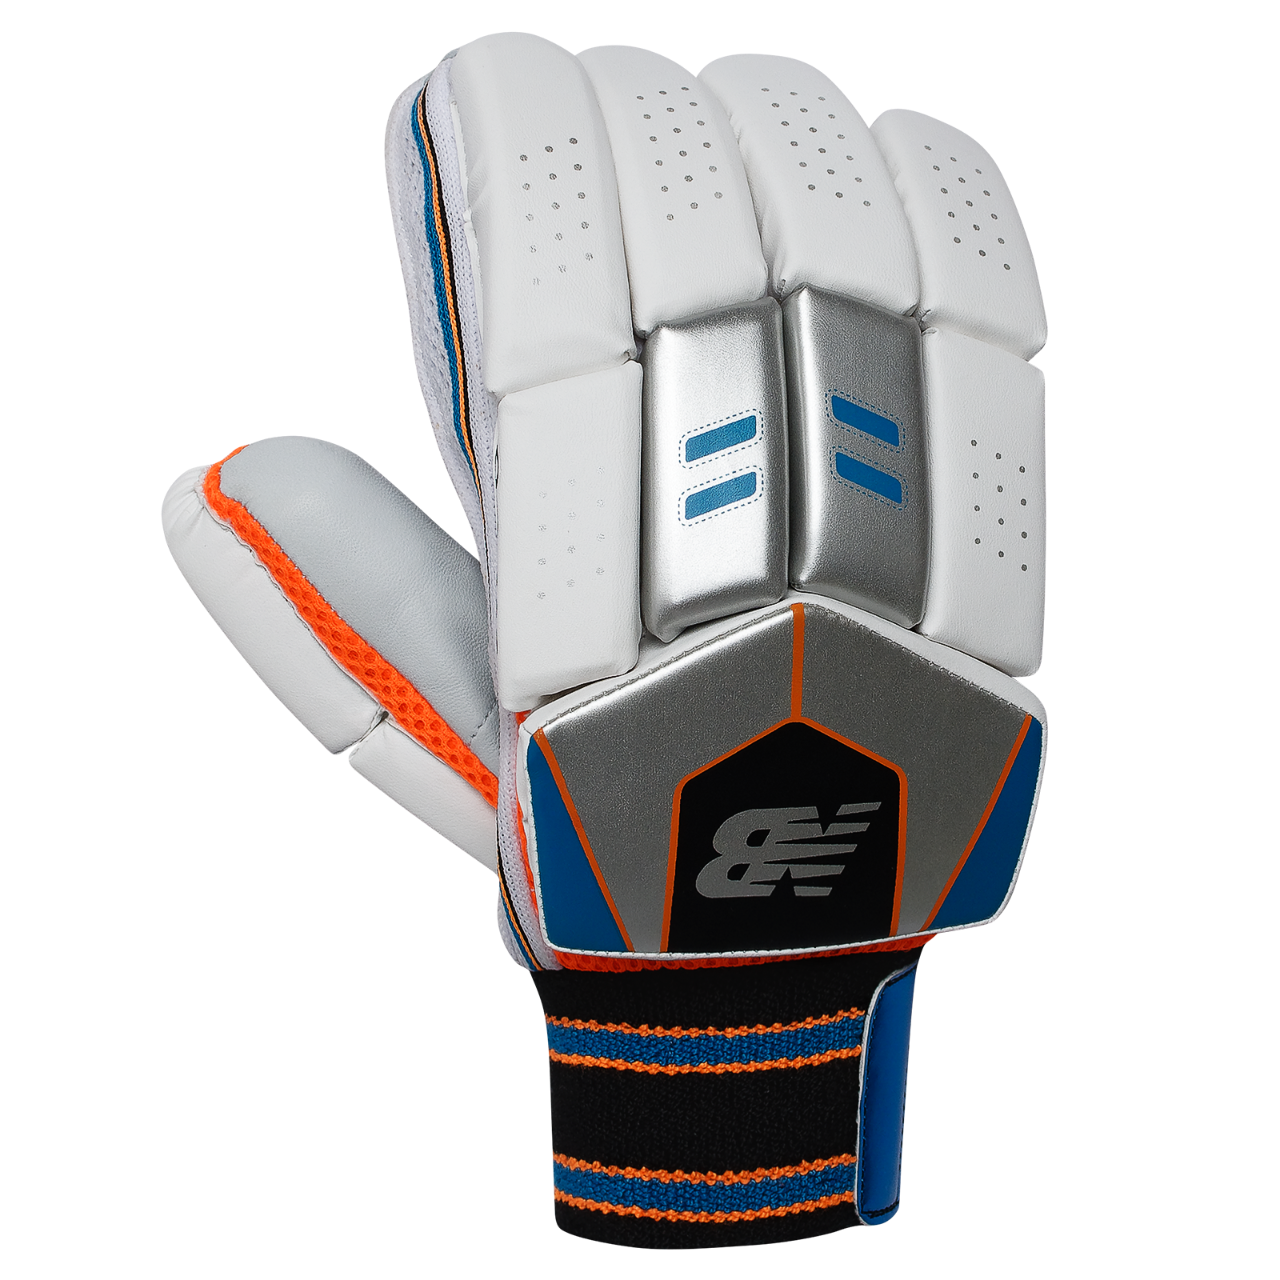 2021 New Balance DC 480 Junior Batting Gloves